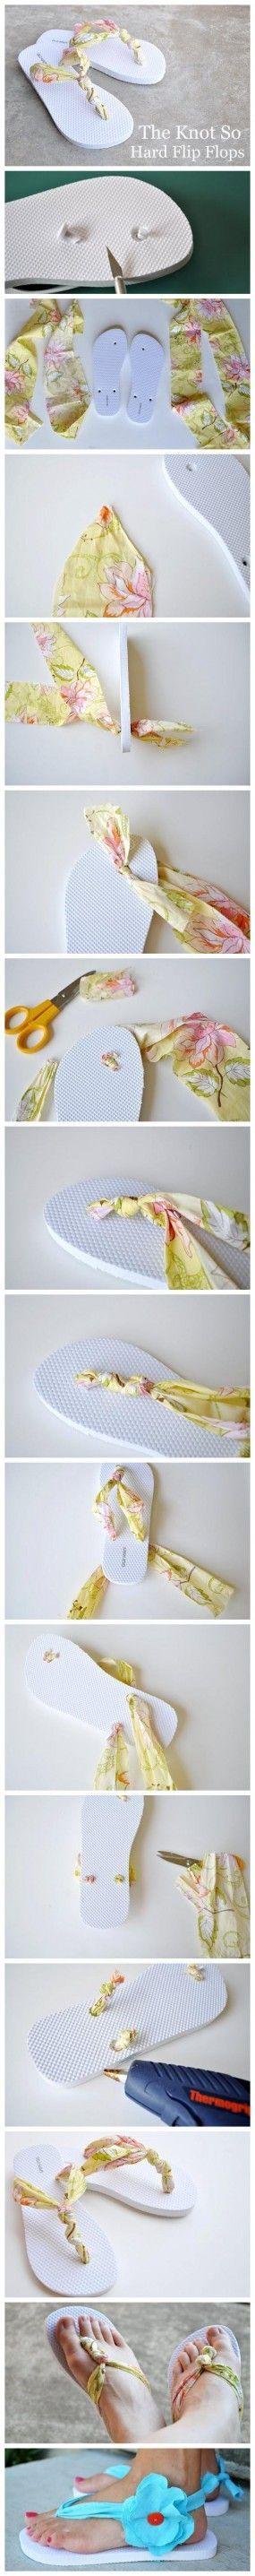 18 best DIY sandals/shoes images on Pinterest | Decorated flip flops ...